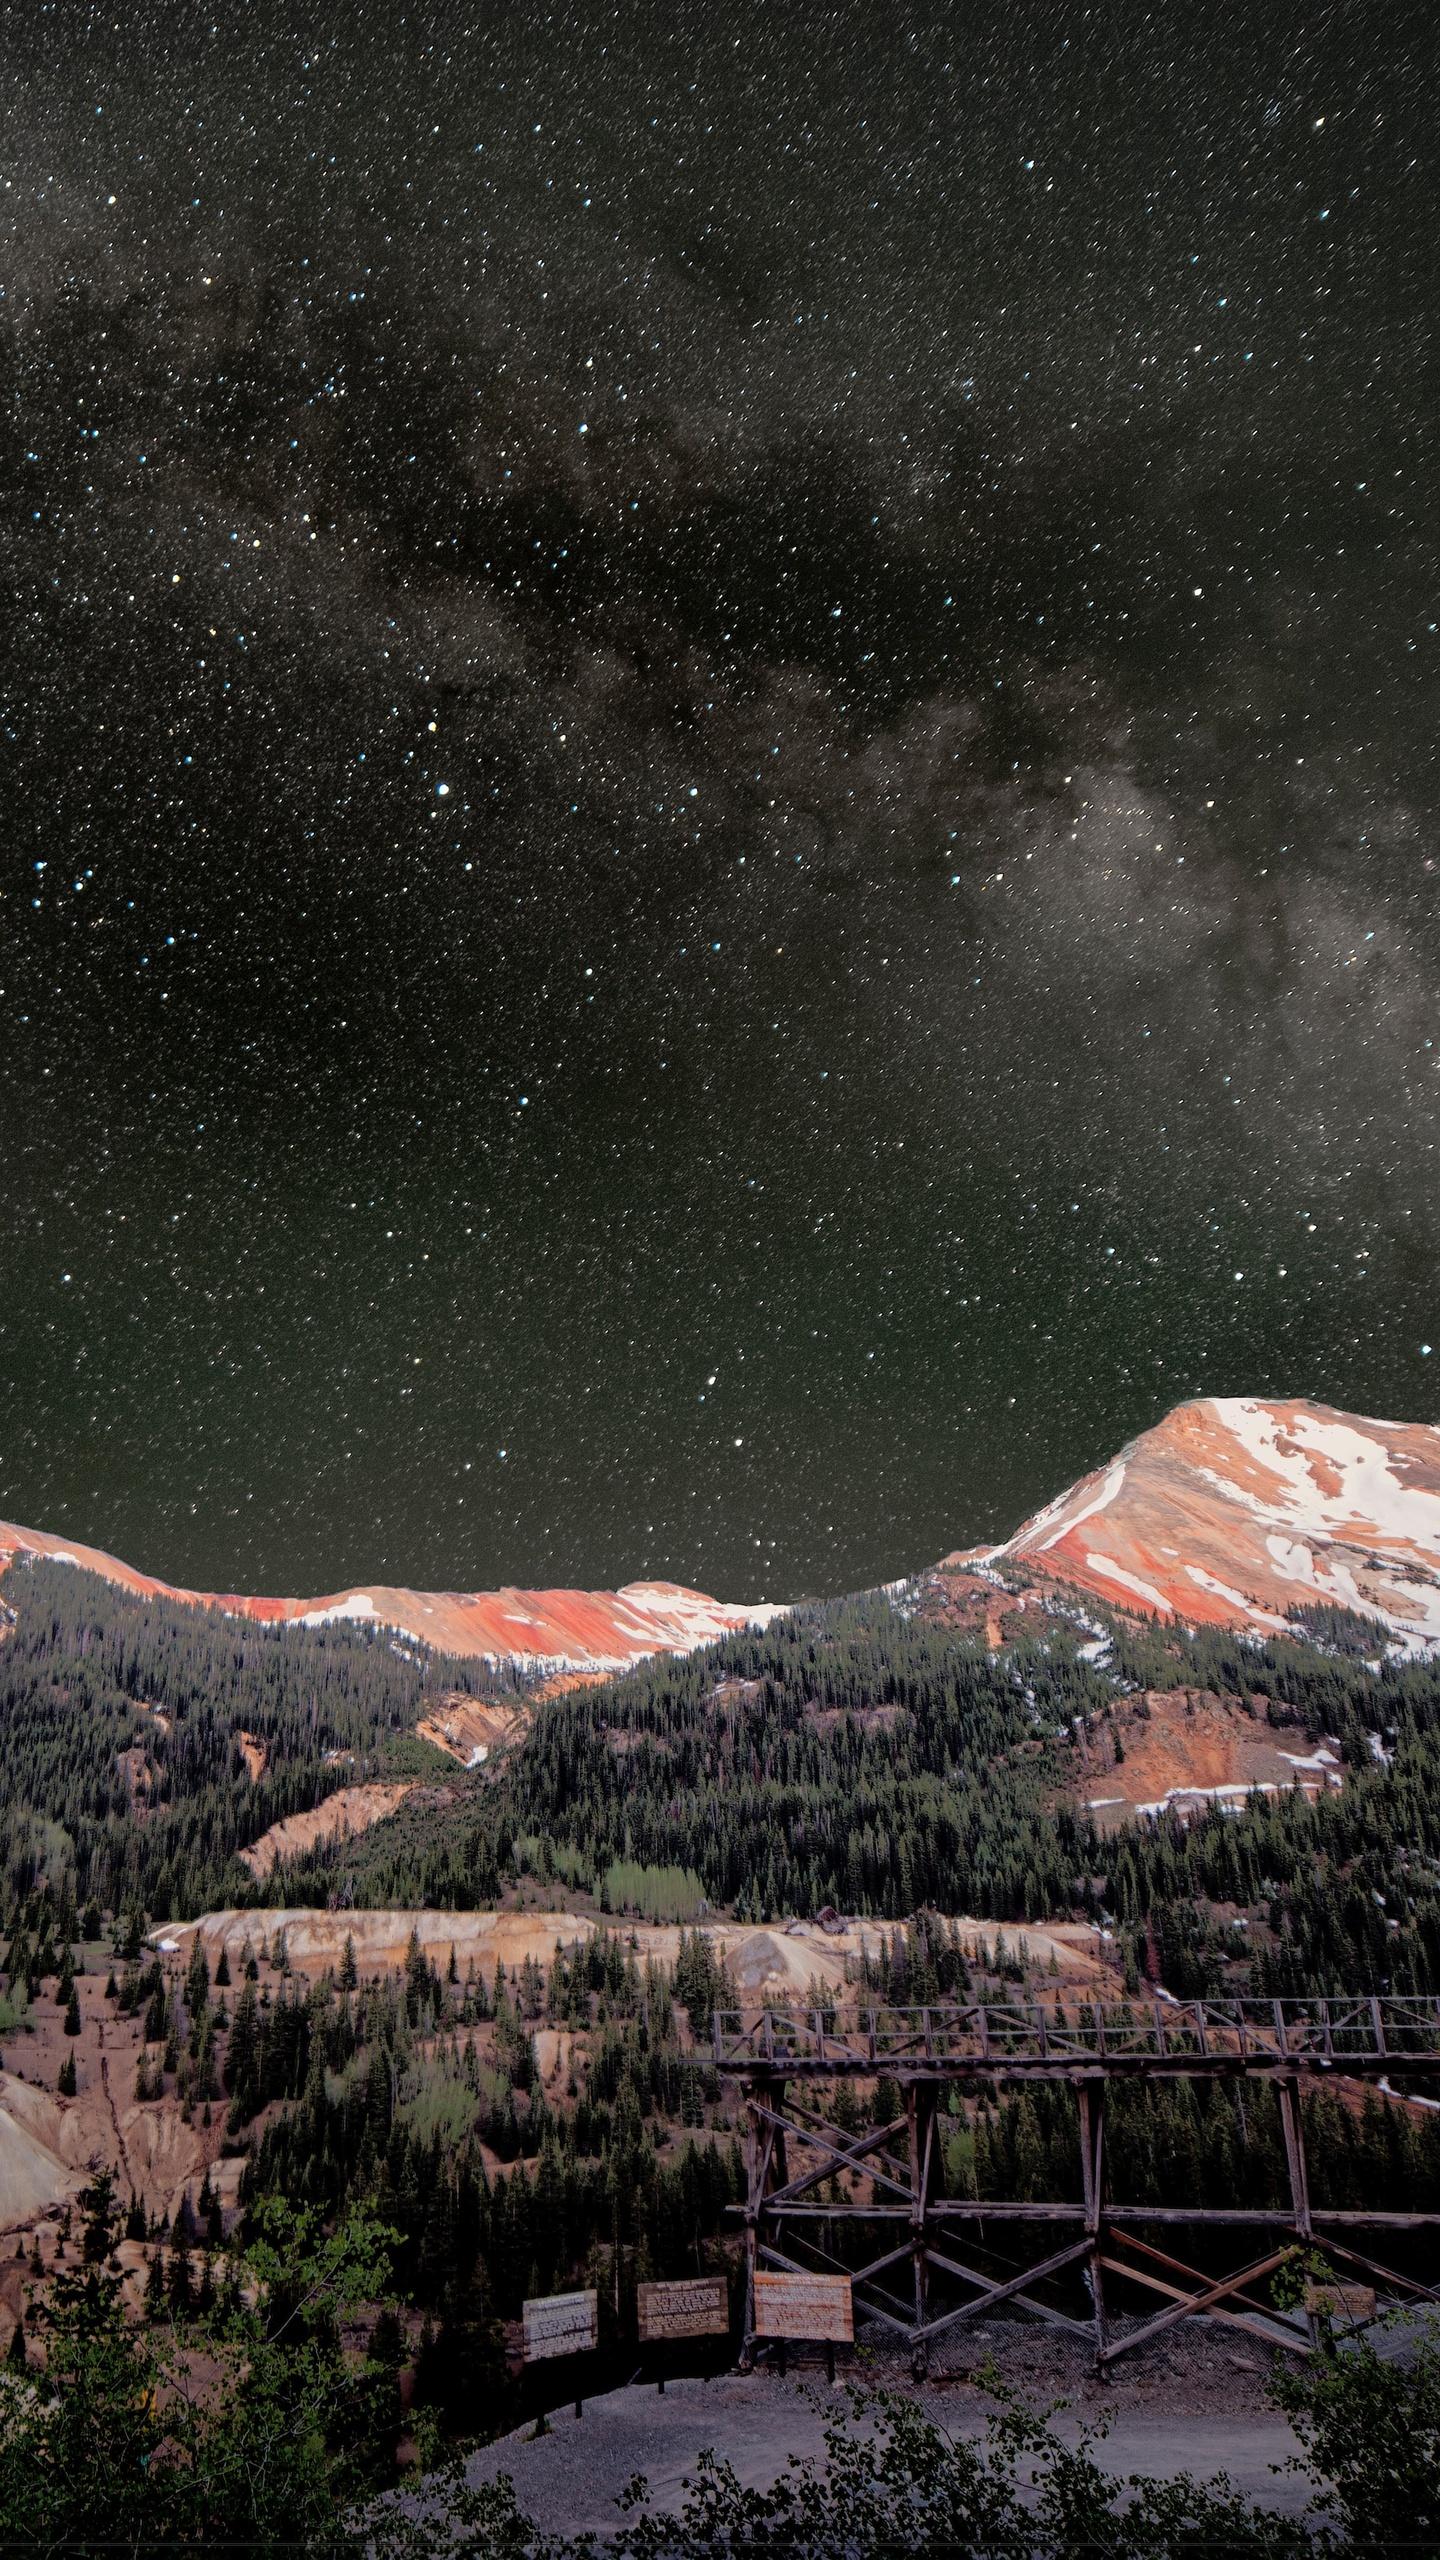 milky-way-above-red-mountains-8k-2n.jpg